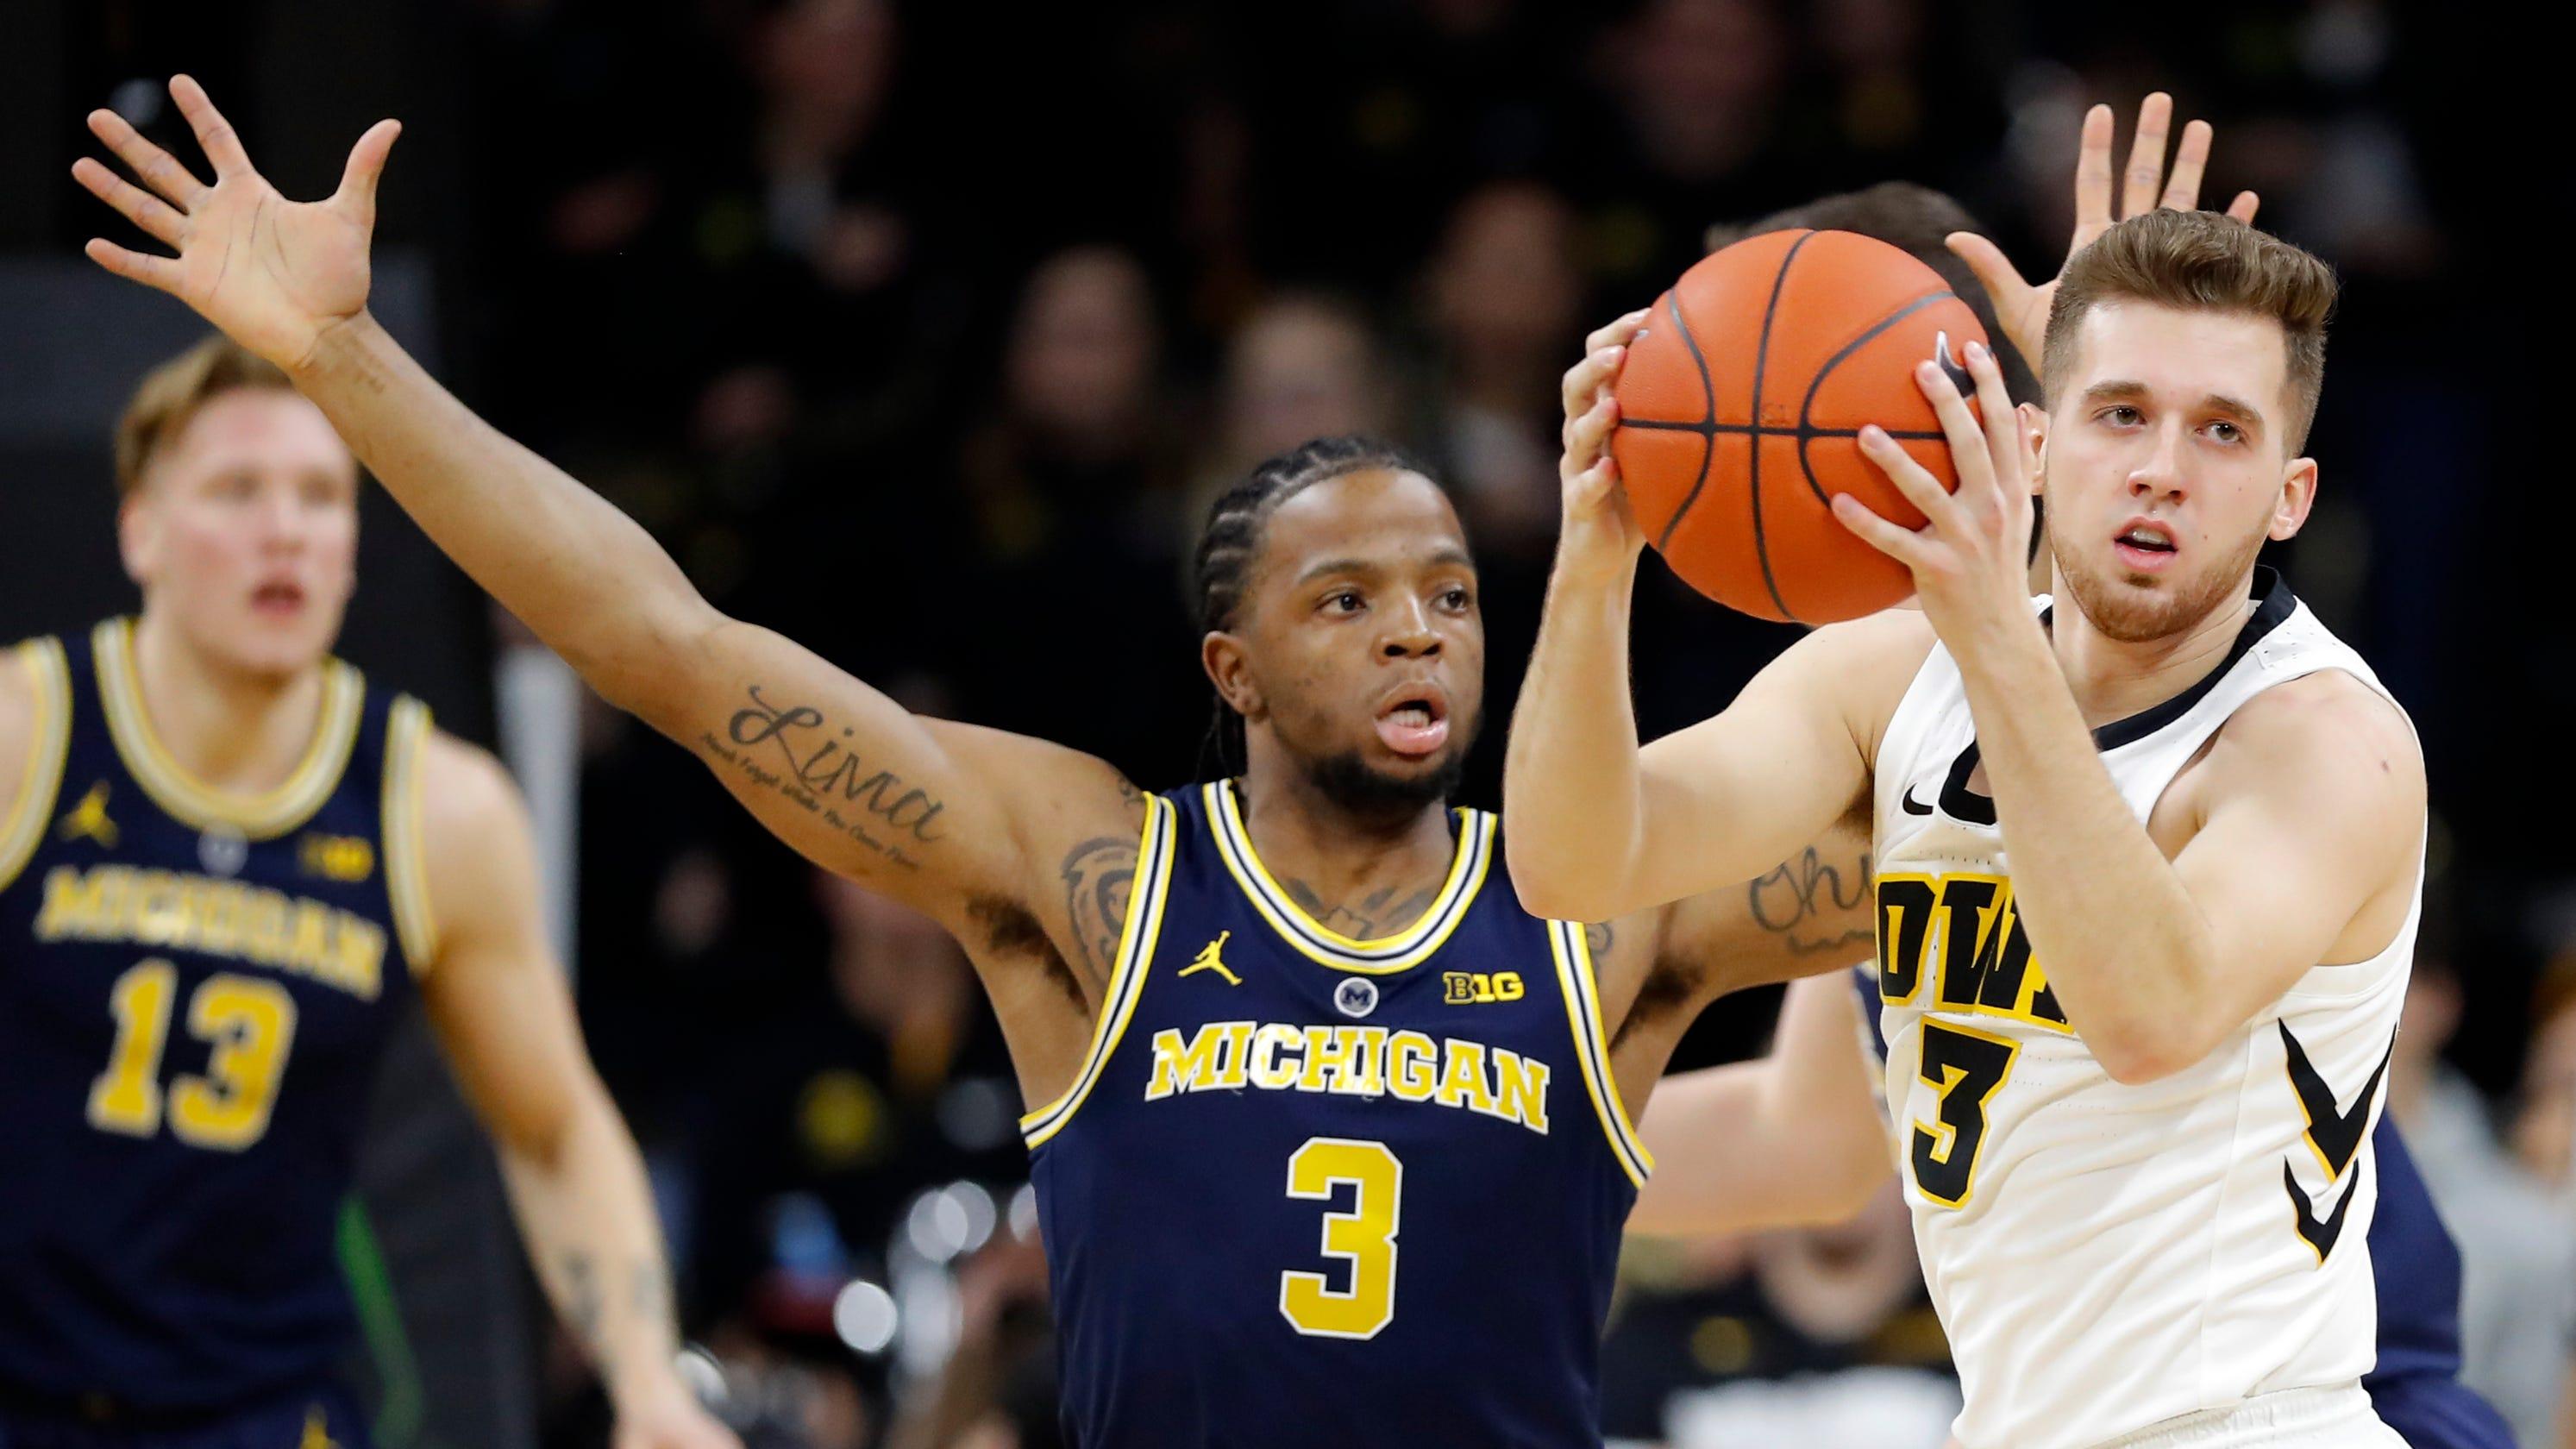 ee2edbdacb9d Michigan basketball s lack of depth exposed in loss at Iowa